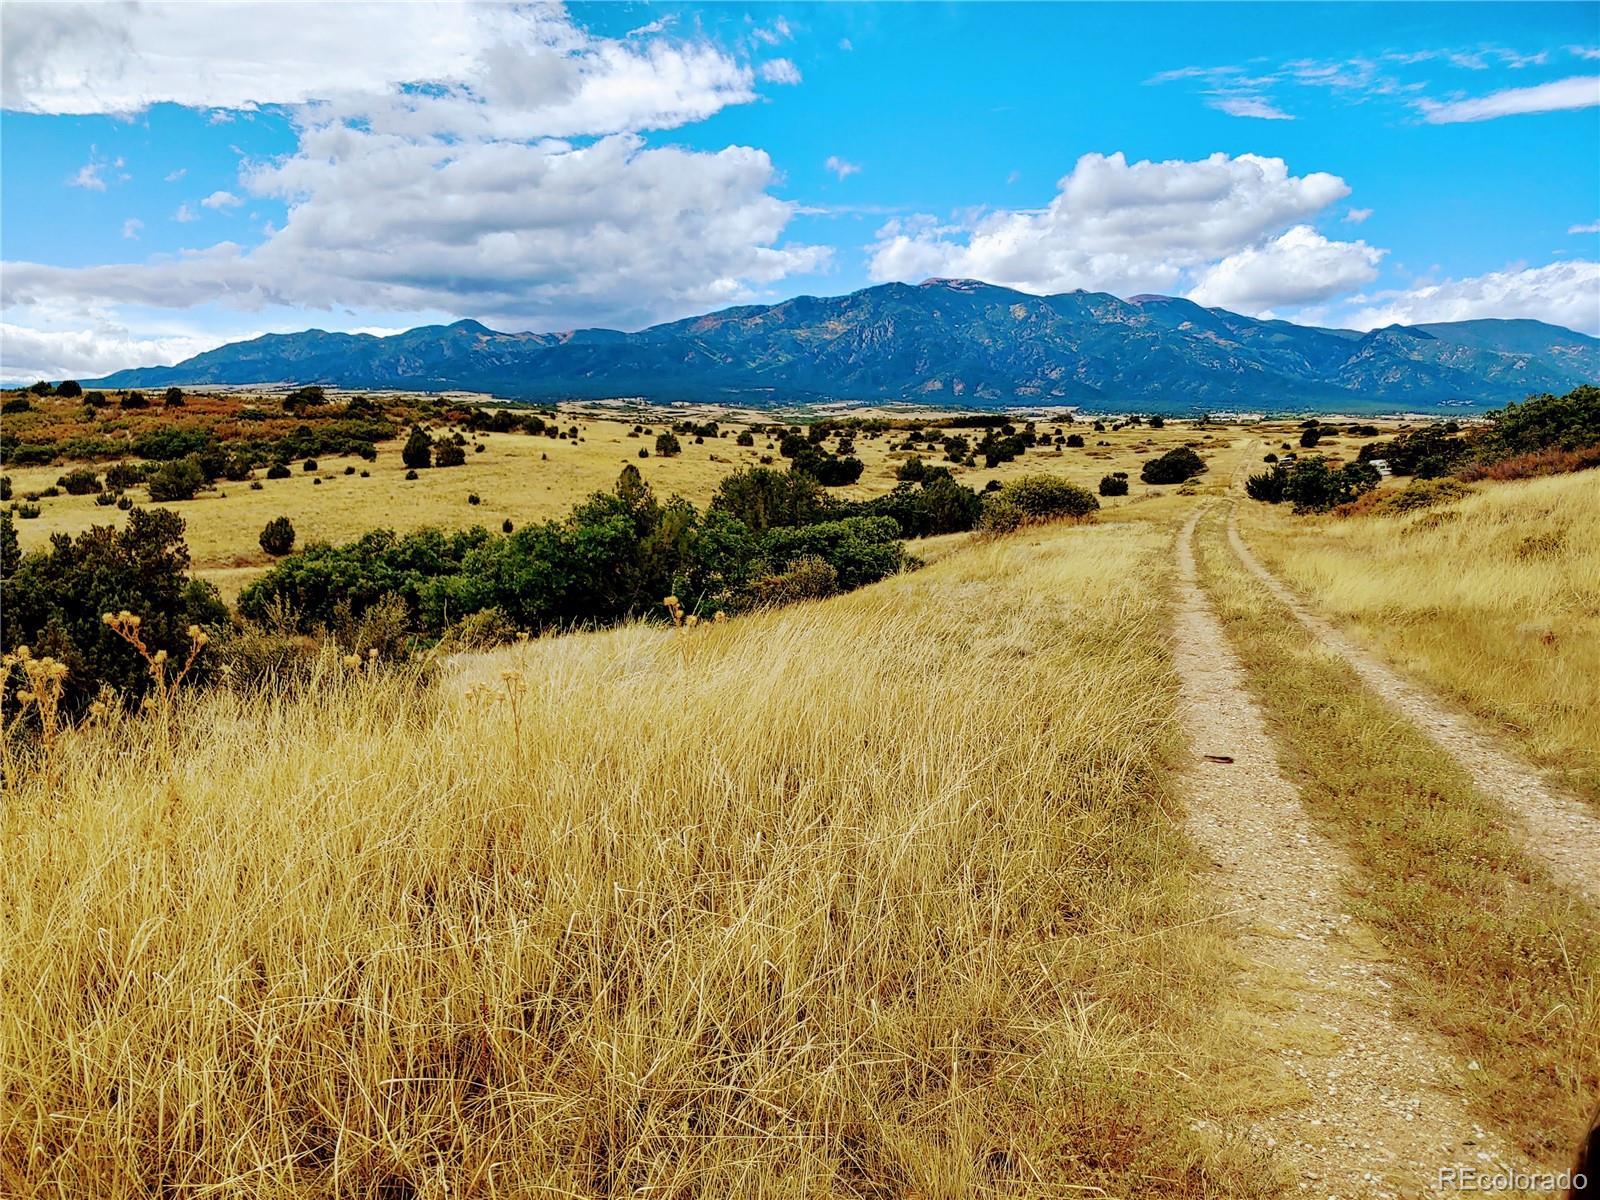 000 Greenhorn Road Property Photo - Colorado City, CO real estate listing